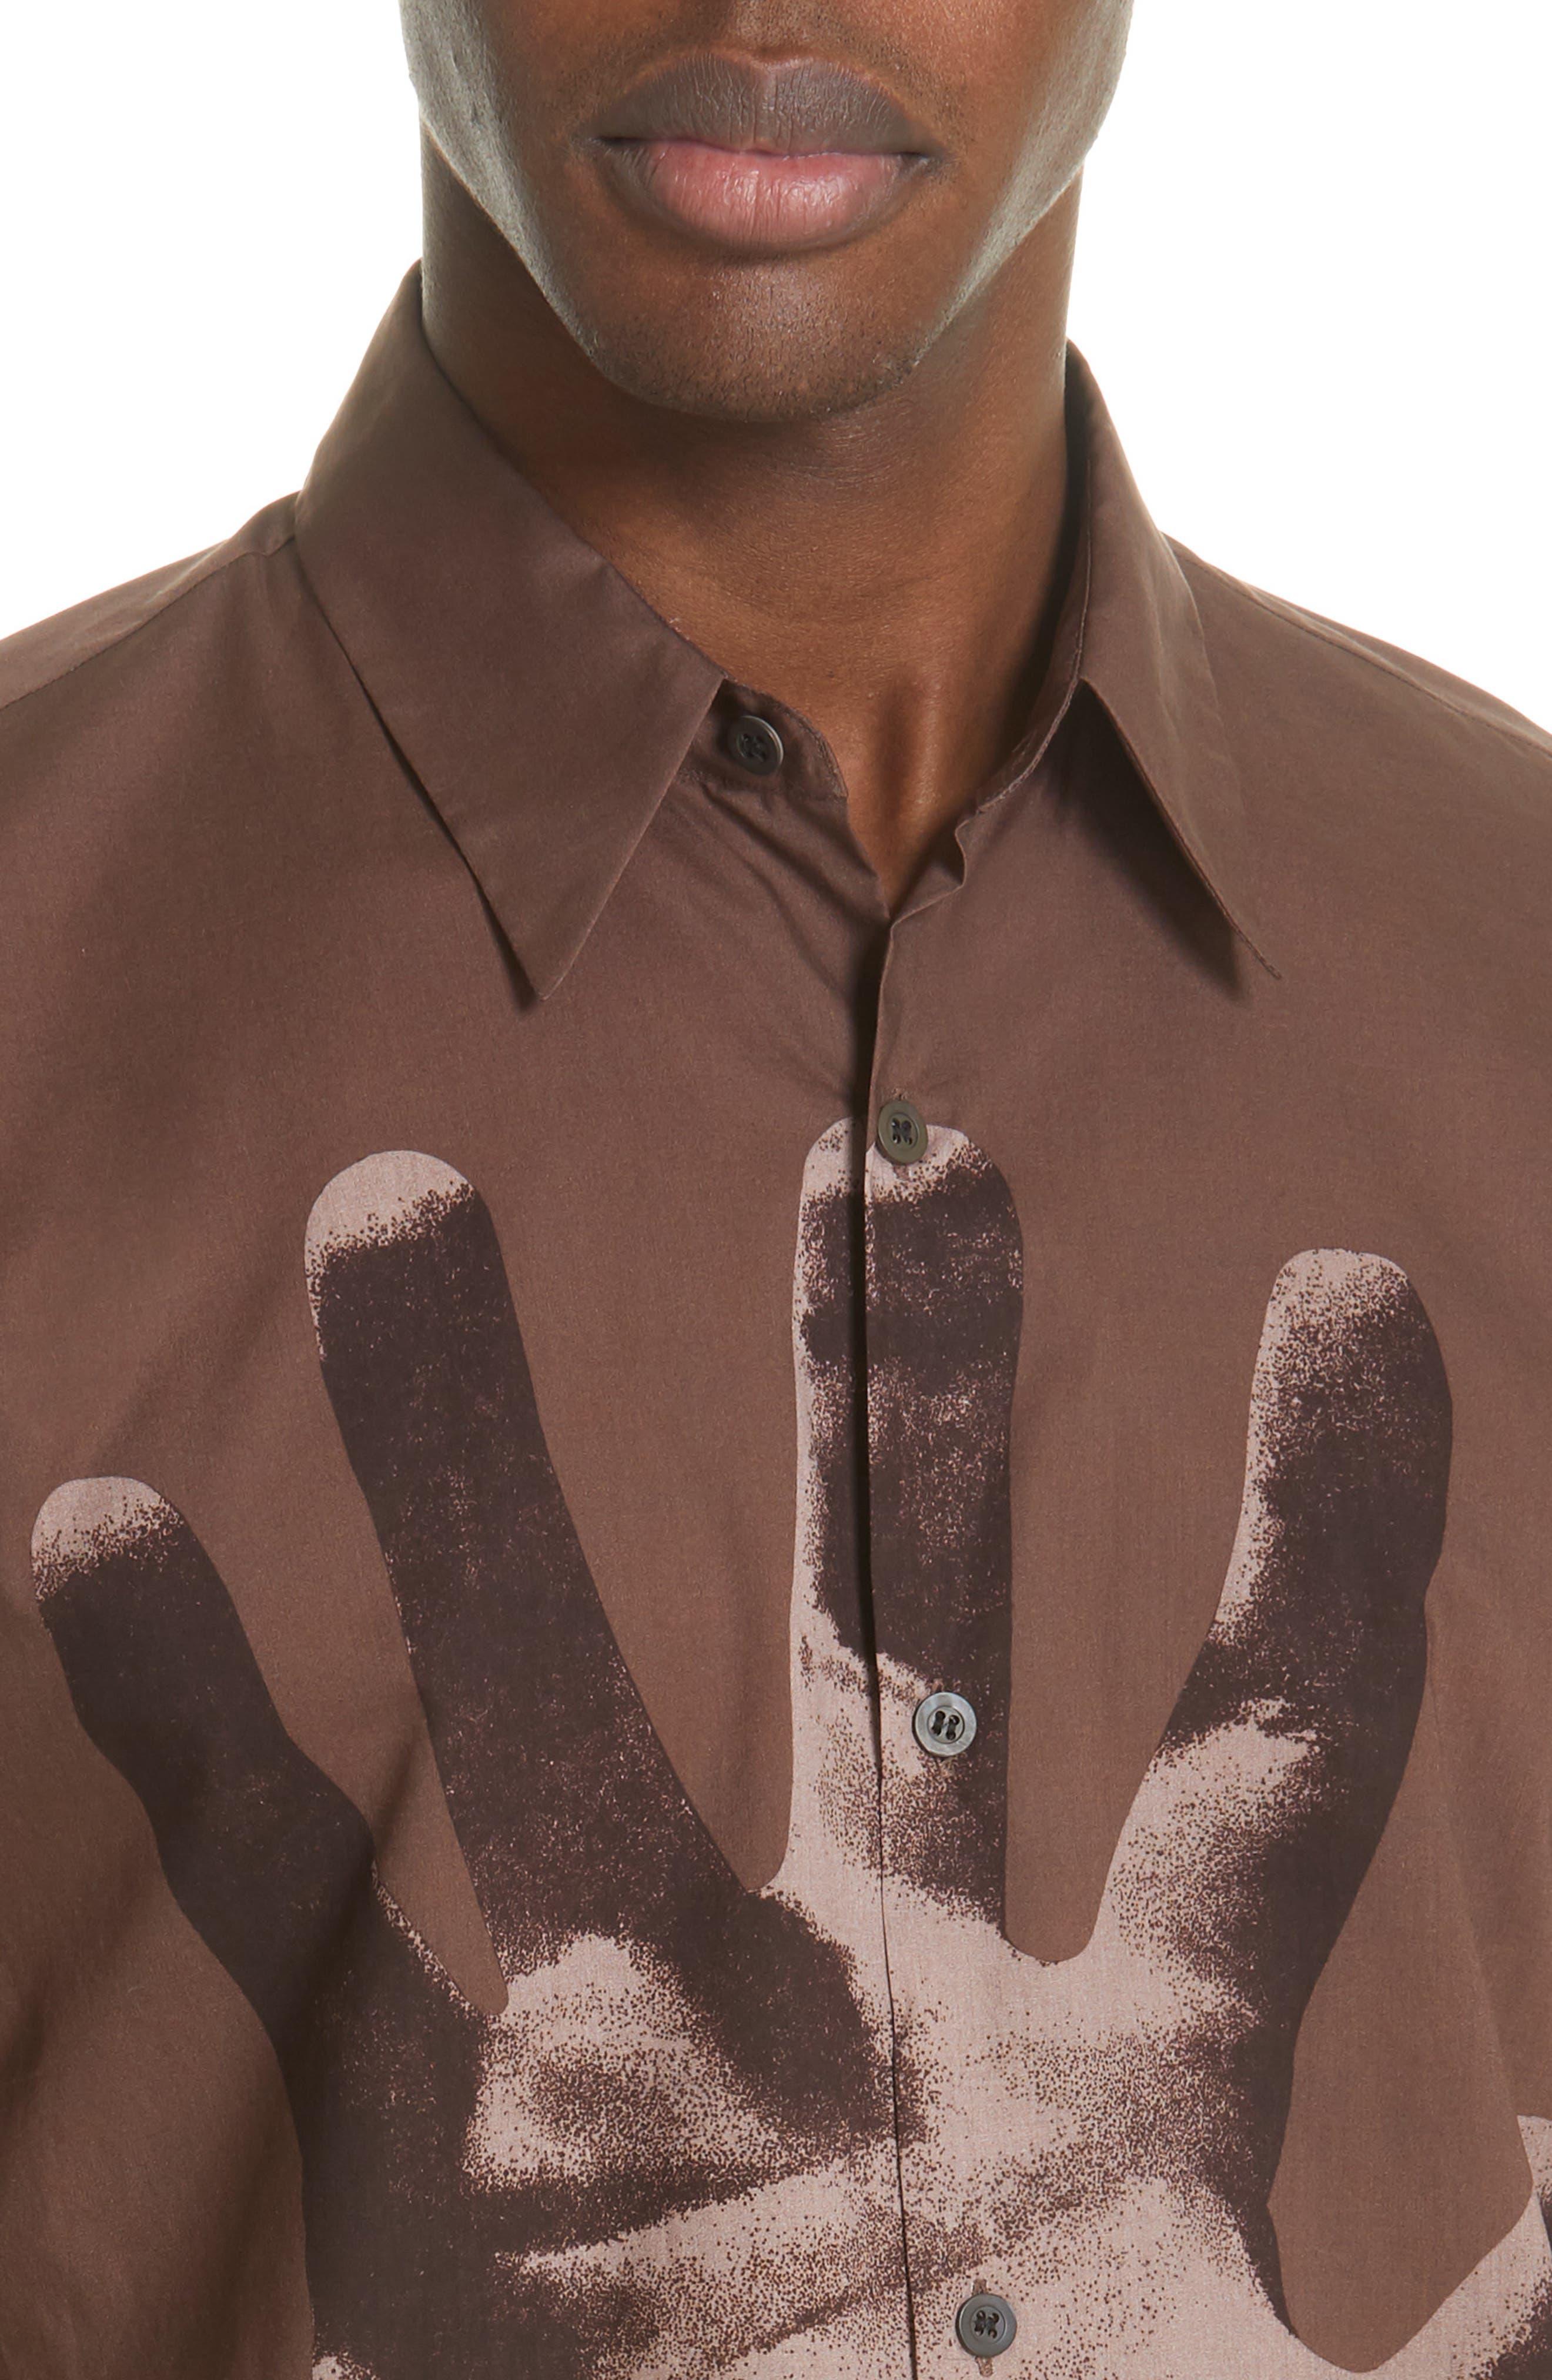 DRIES VAN NOTEN, Clasen Hand Print Shirt, Alternate thumbnail 2, color, BROWN